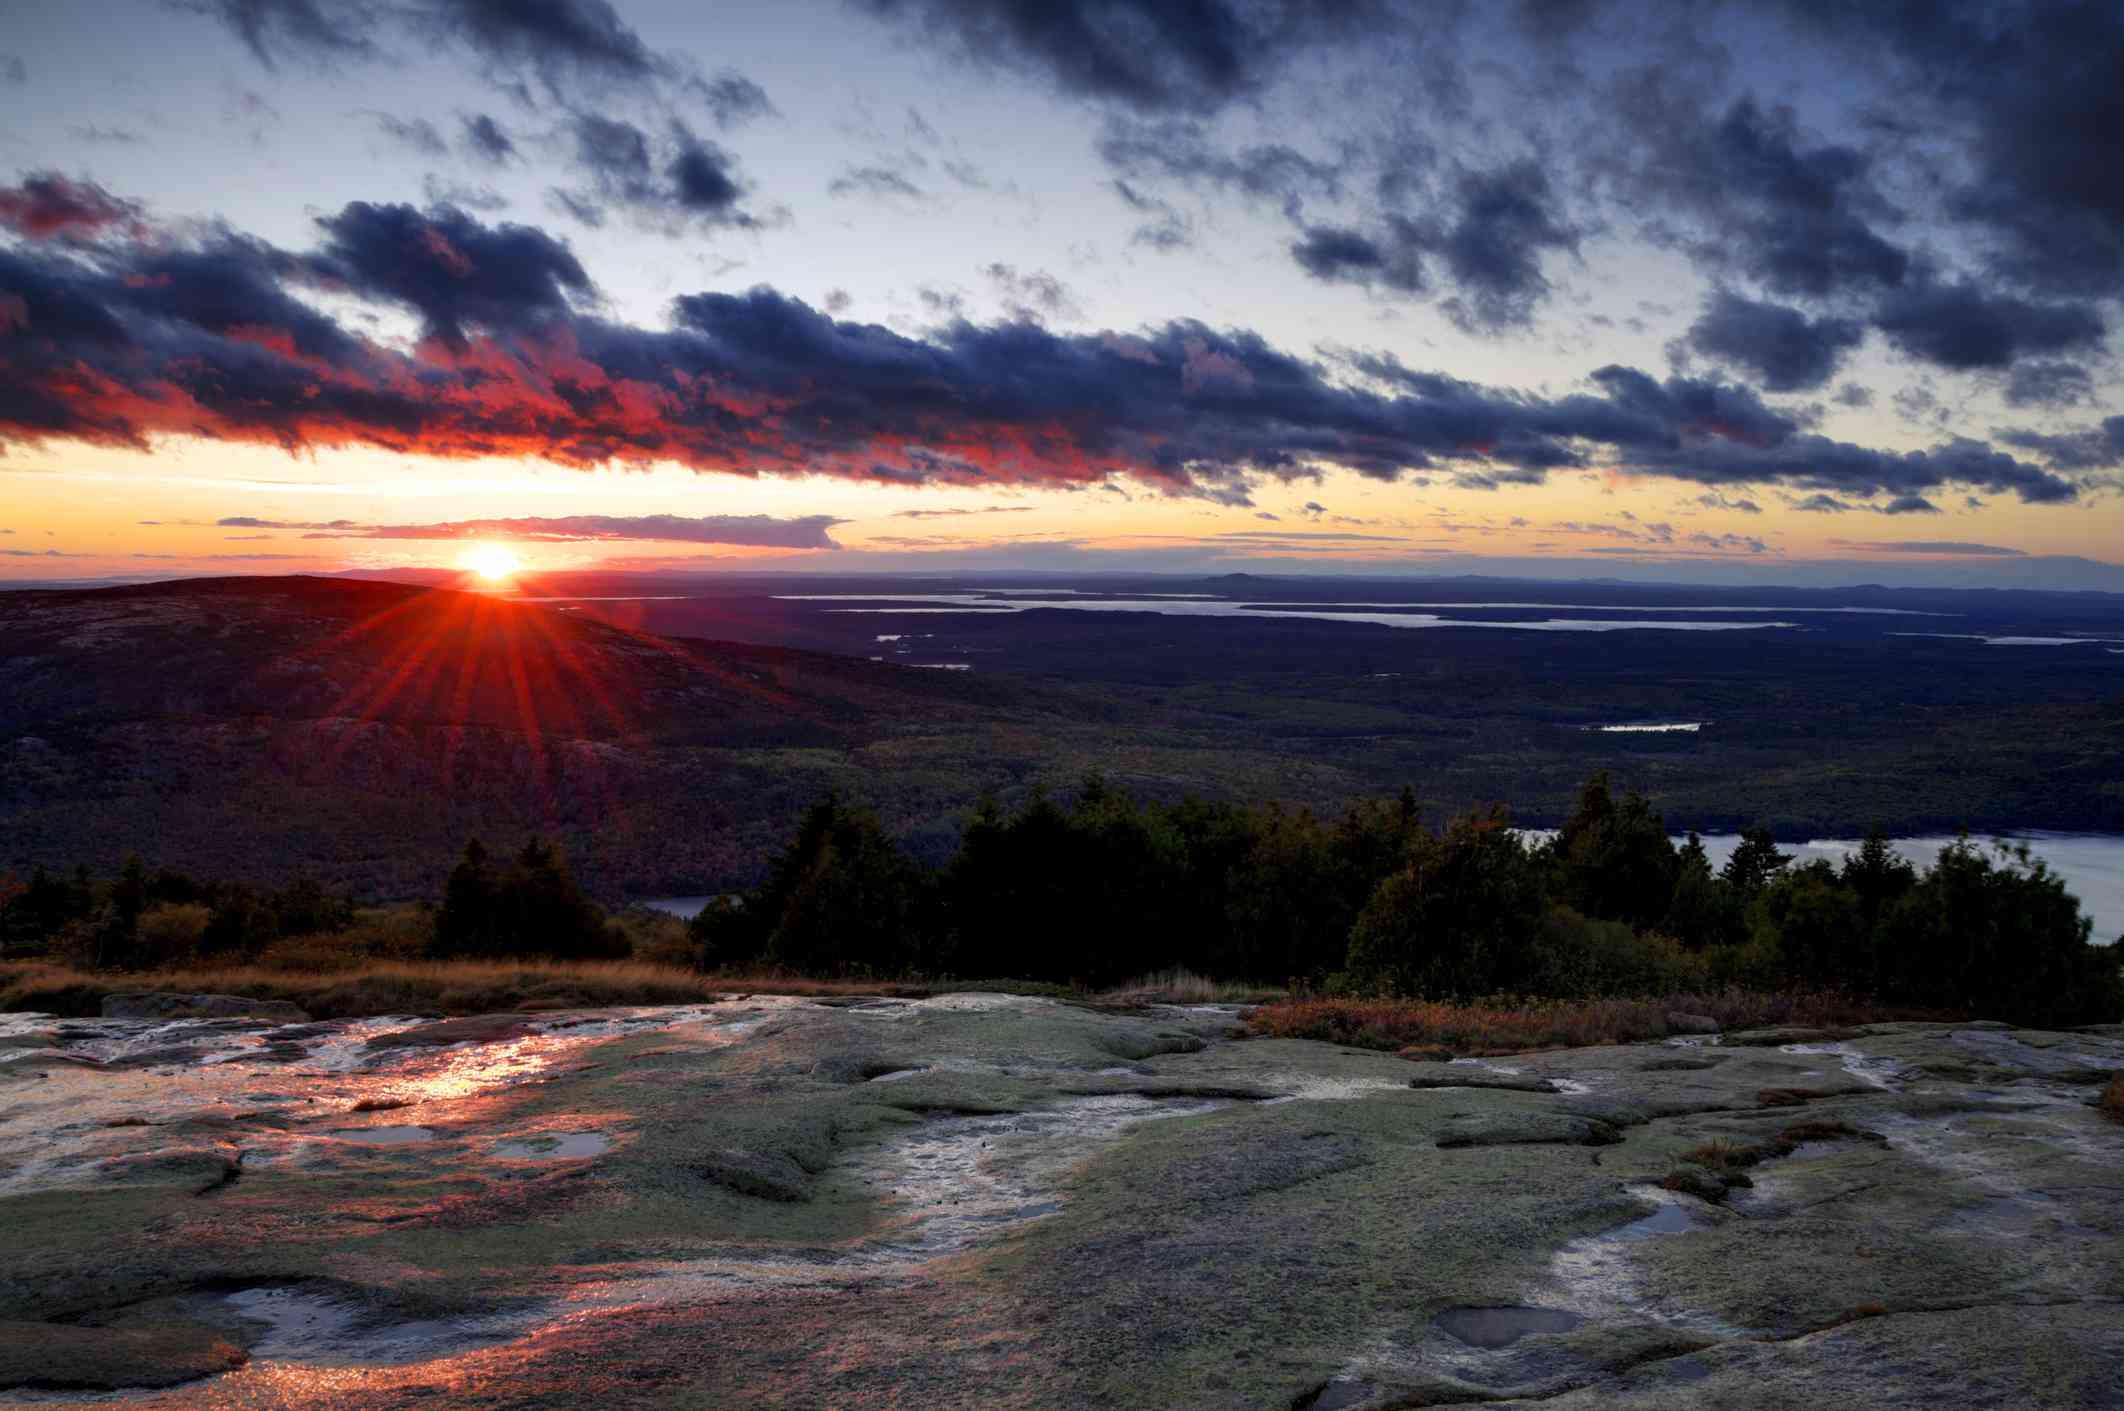 Sunrise over Cadillac Mountain, Acadia National Park